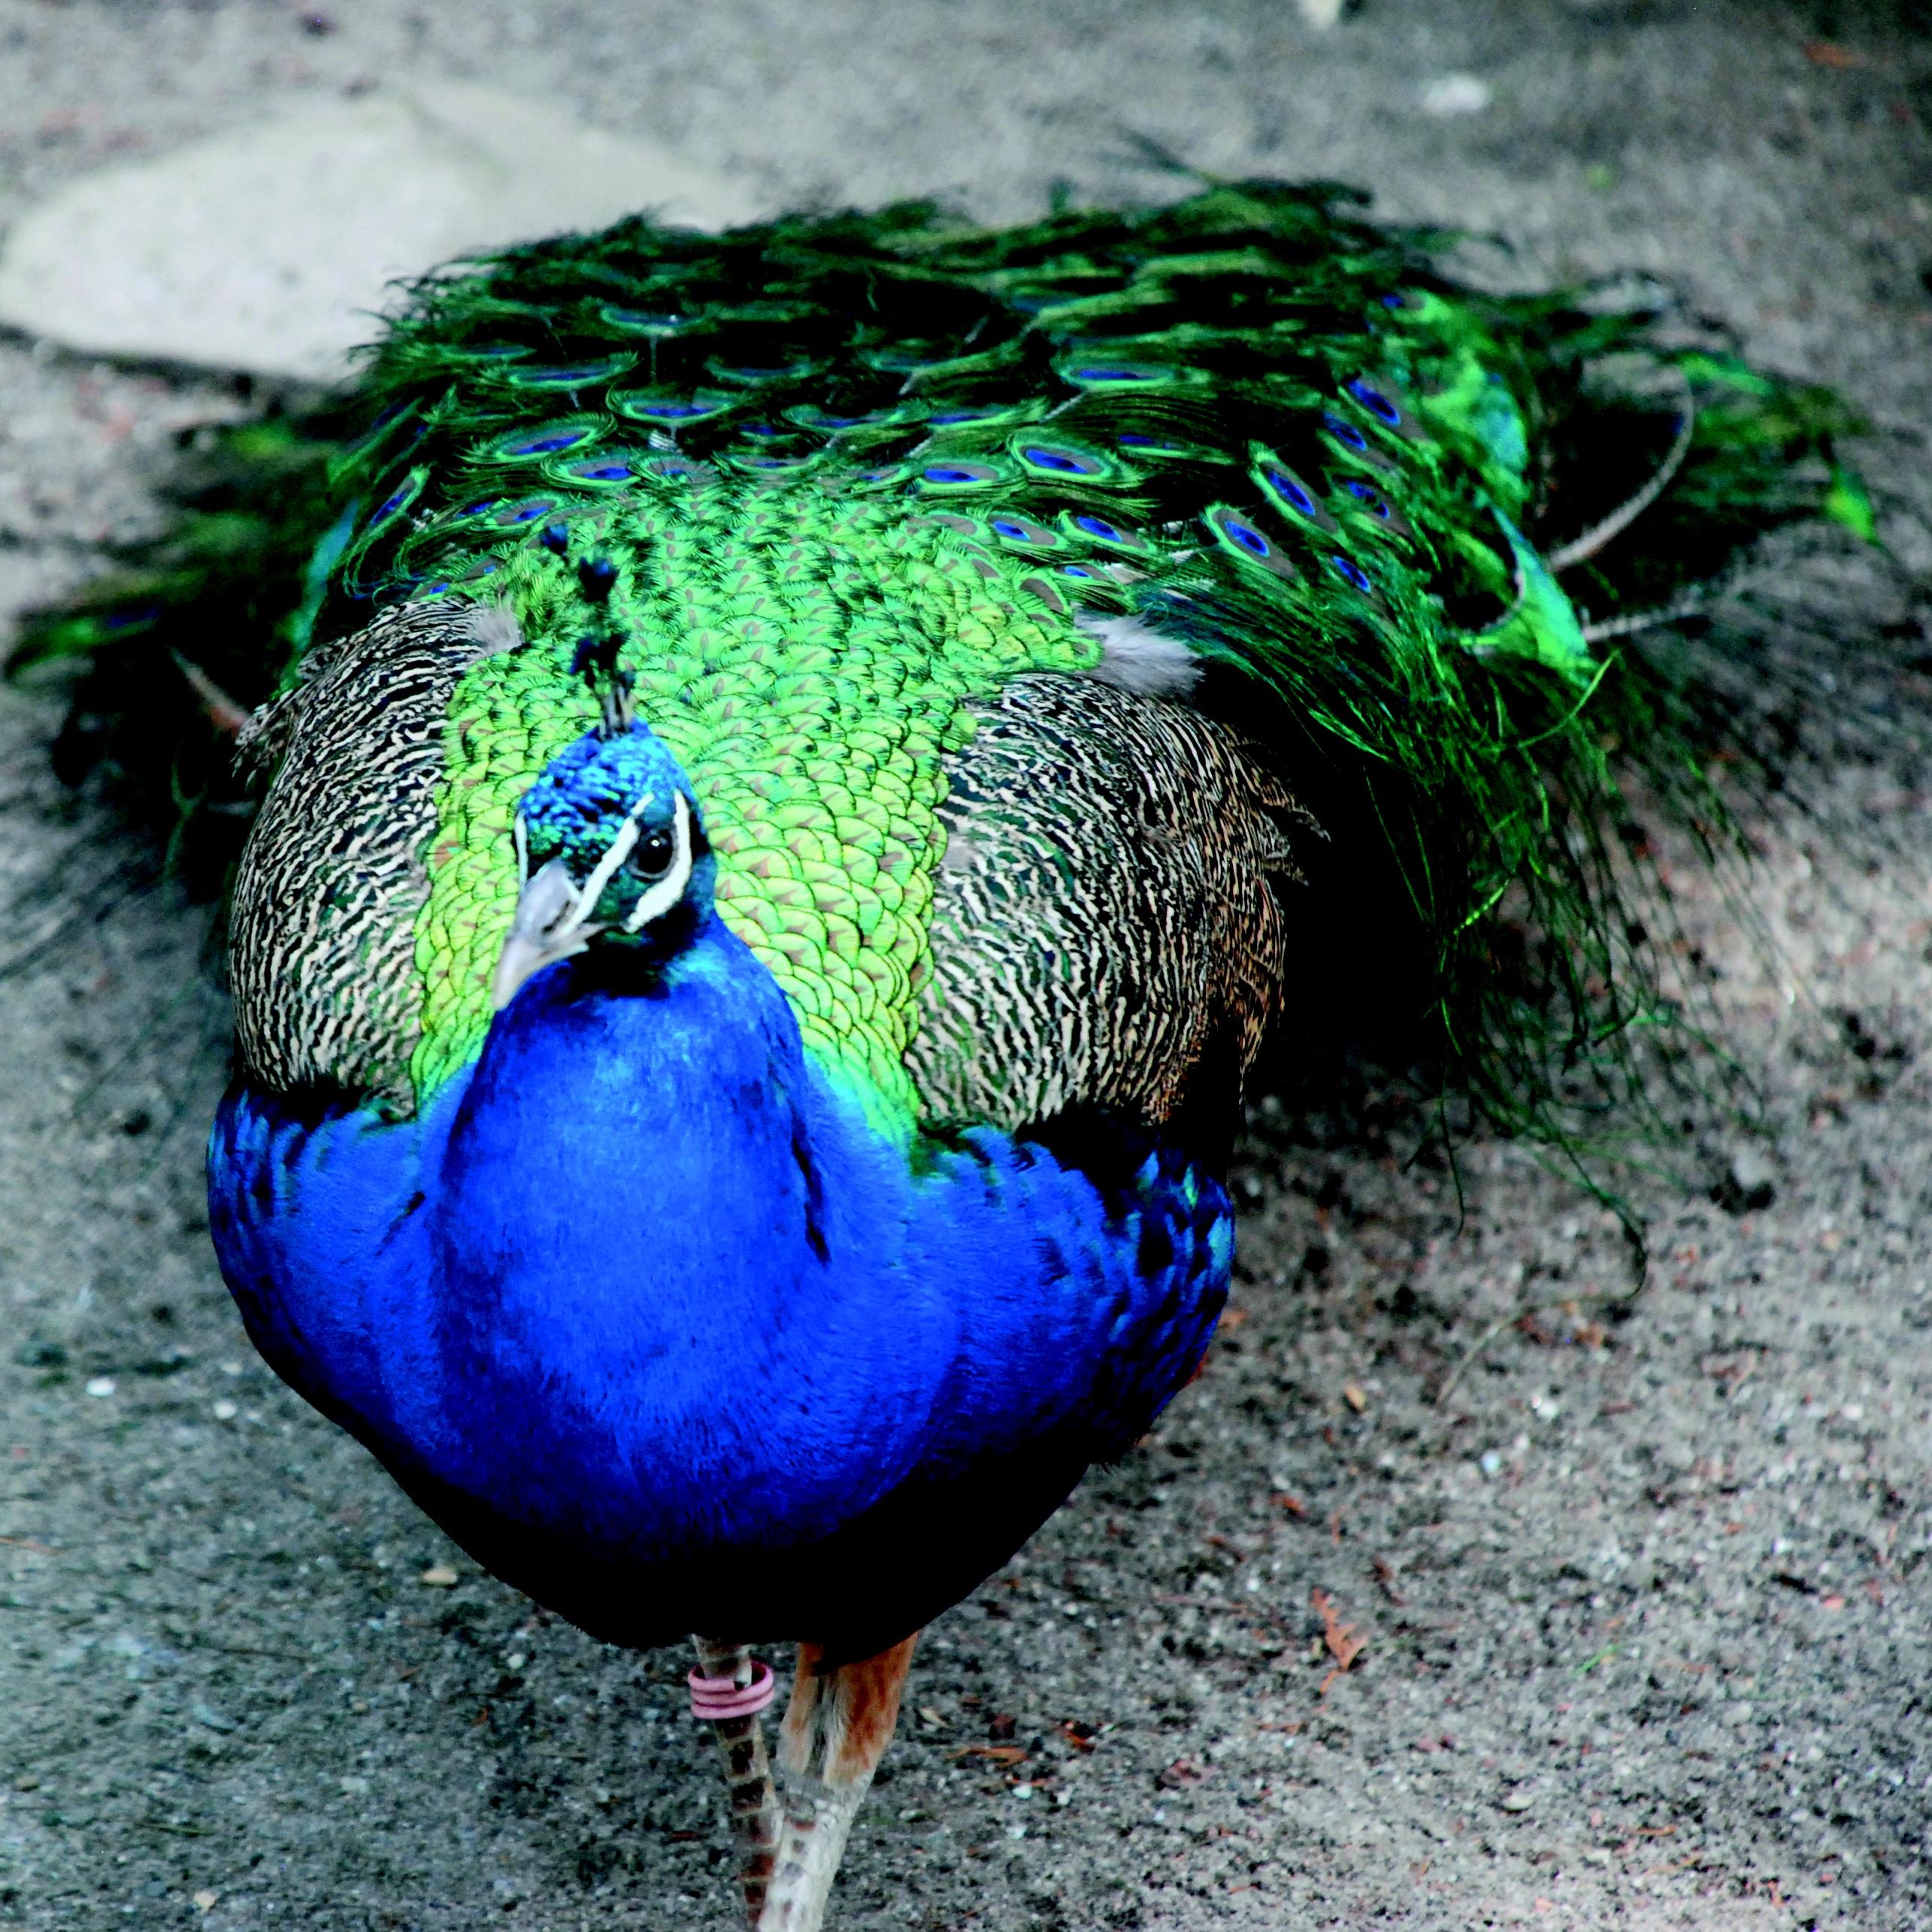 Banco De Imagens Natureza Pássaro Animal Animais